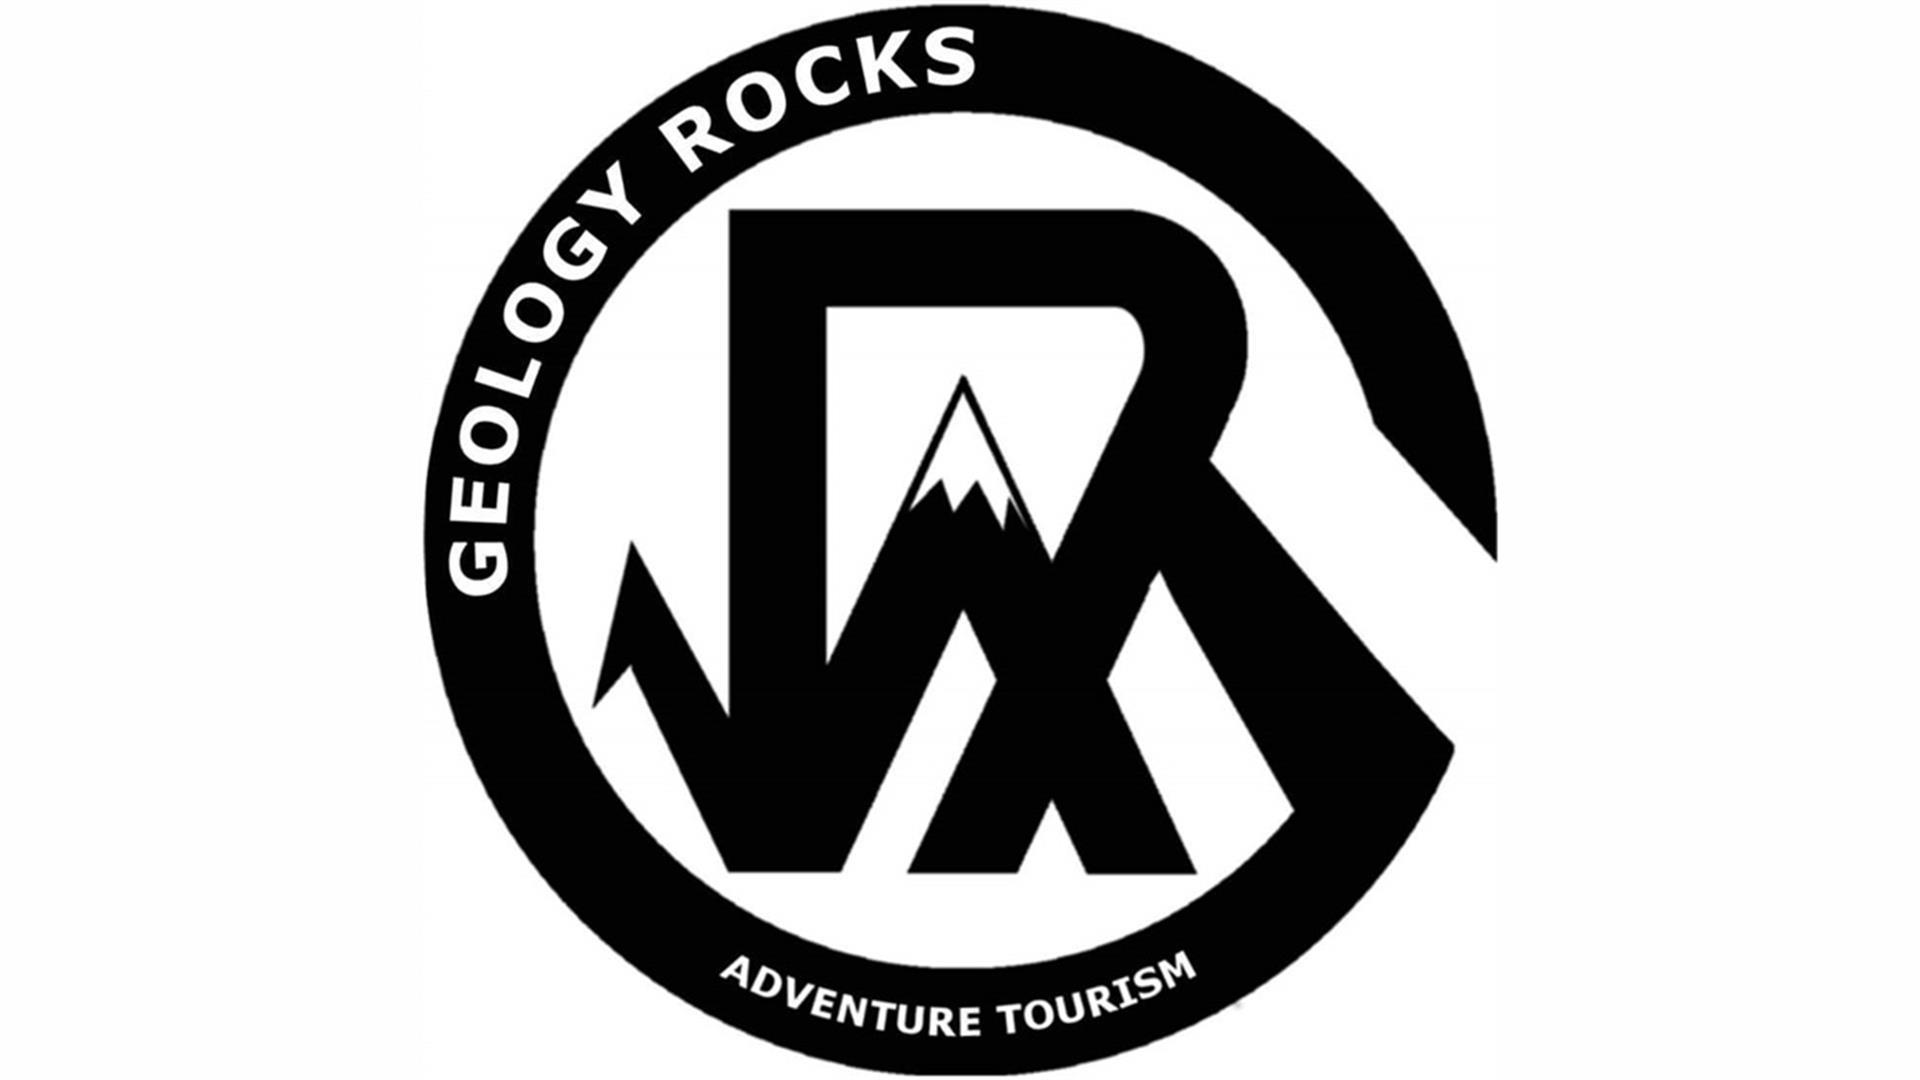 Geology Rocks Adventure Tourism